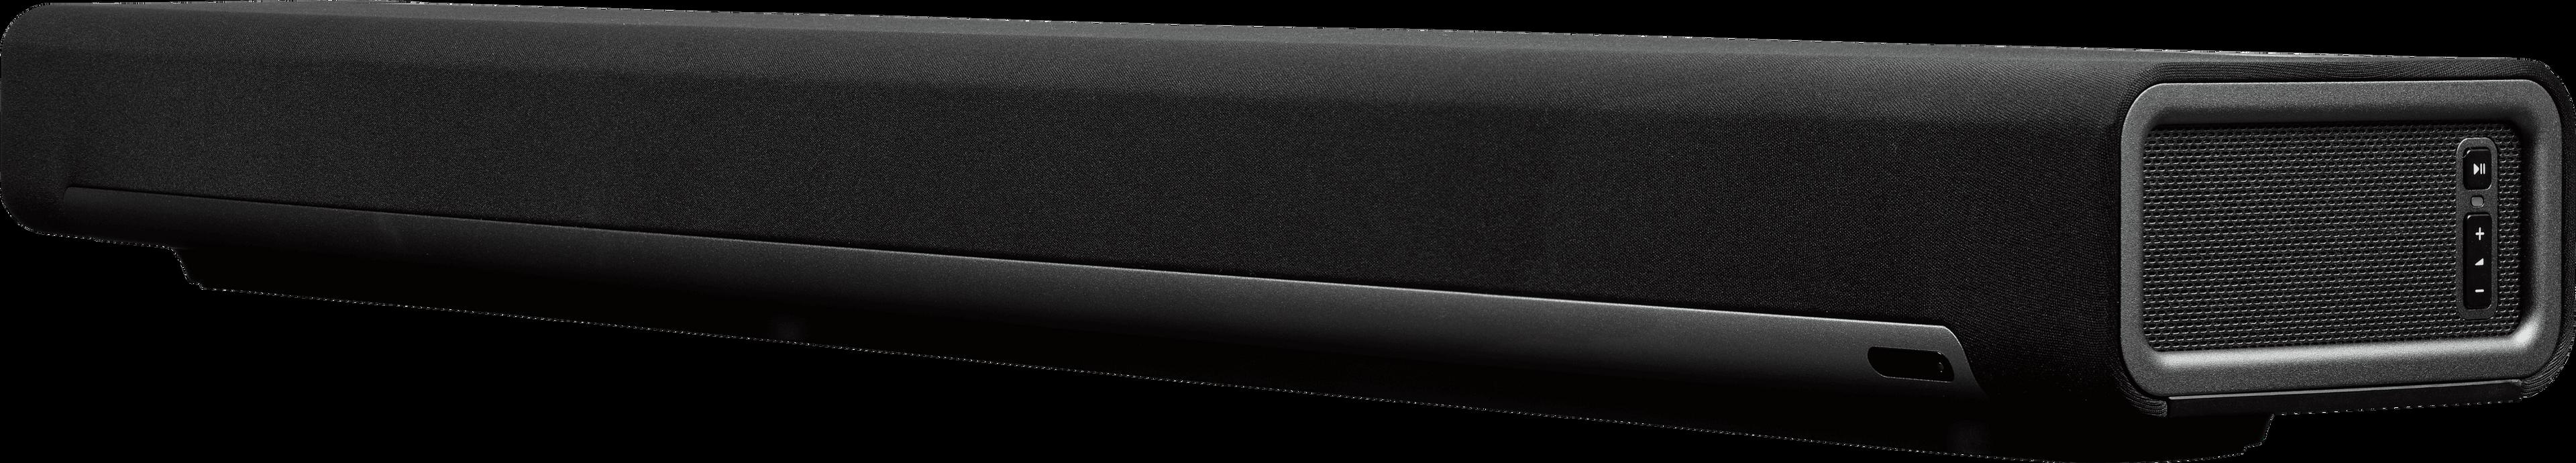 Sonos Playbar - profil